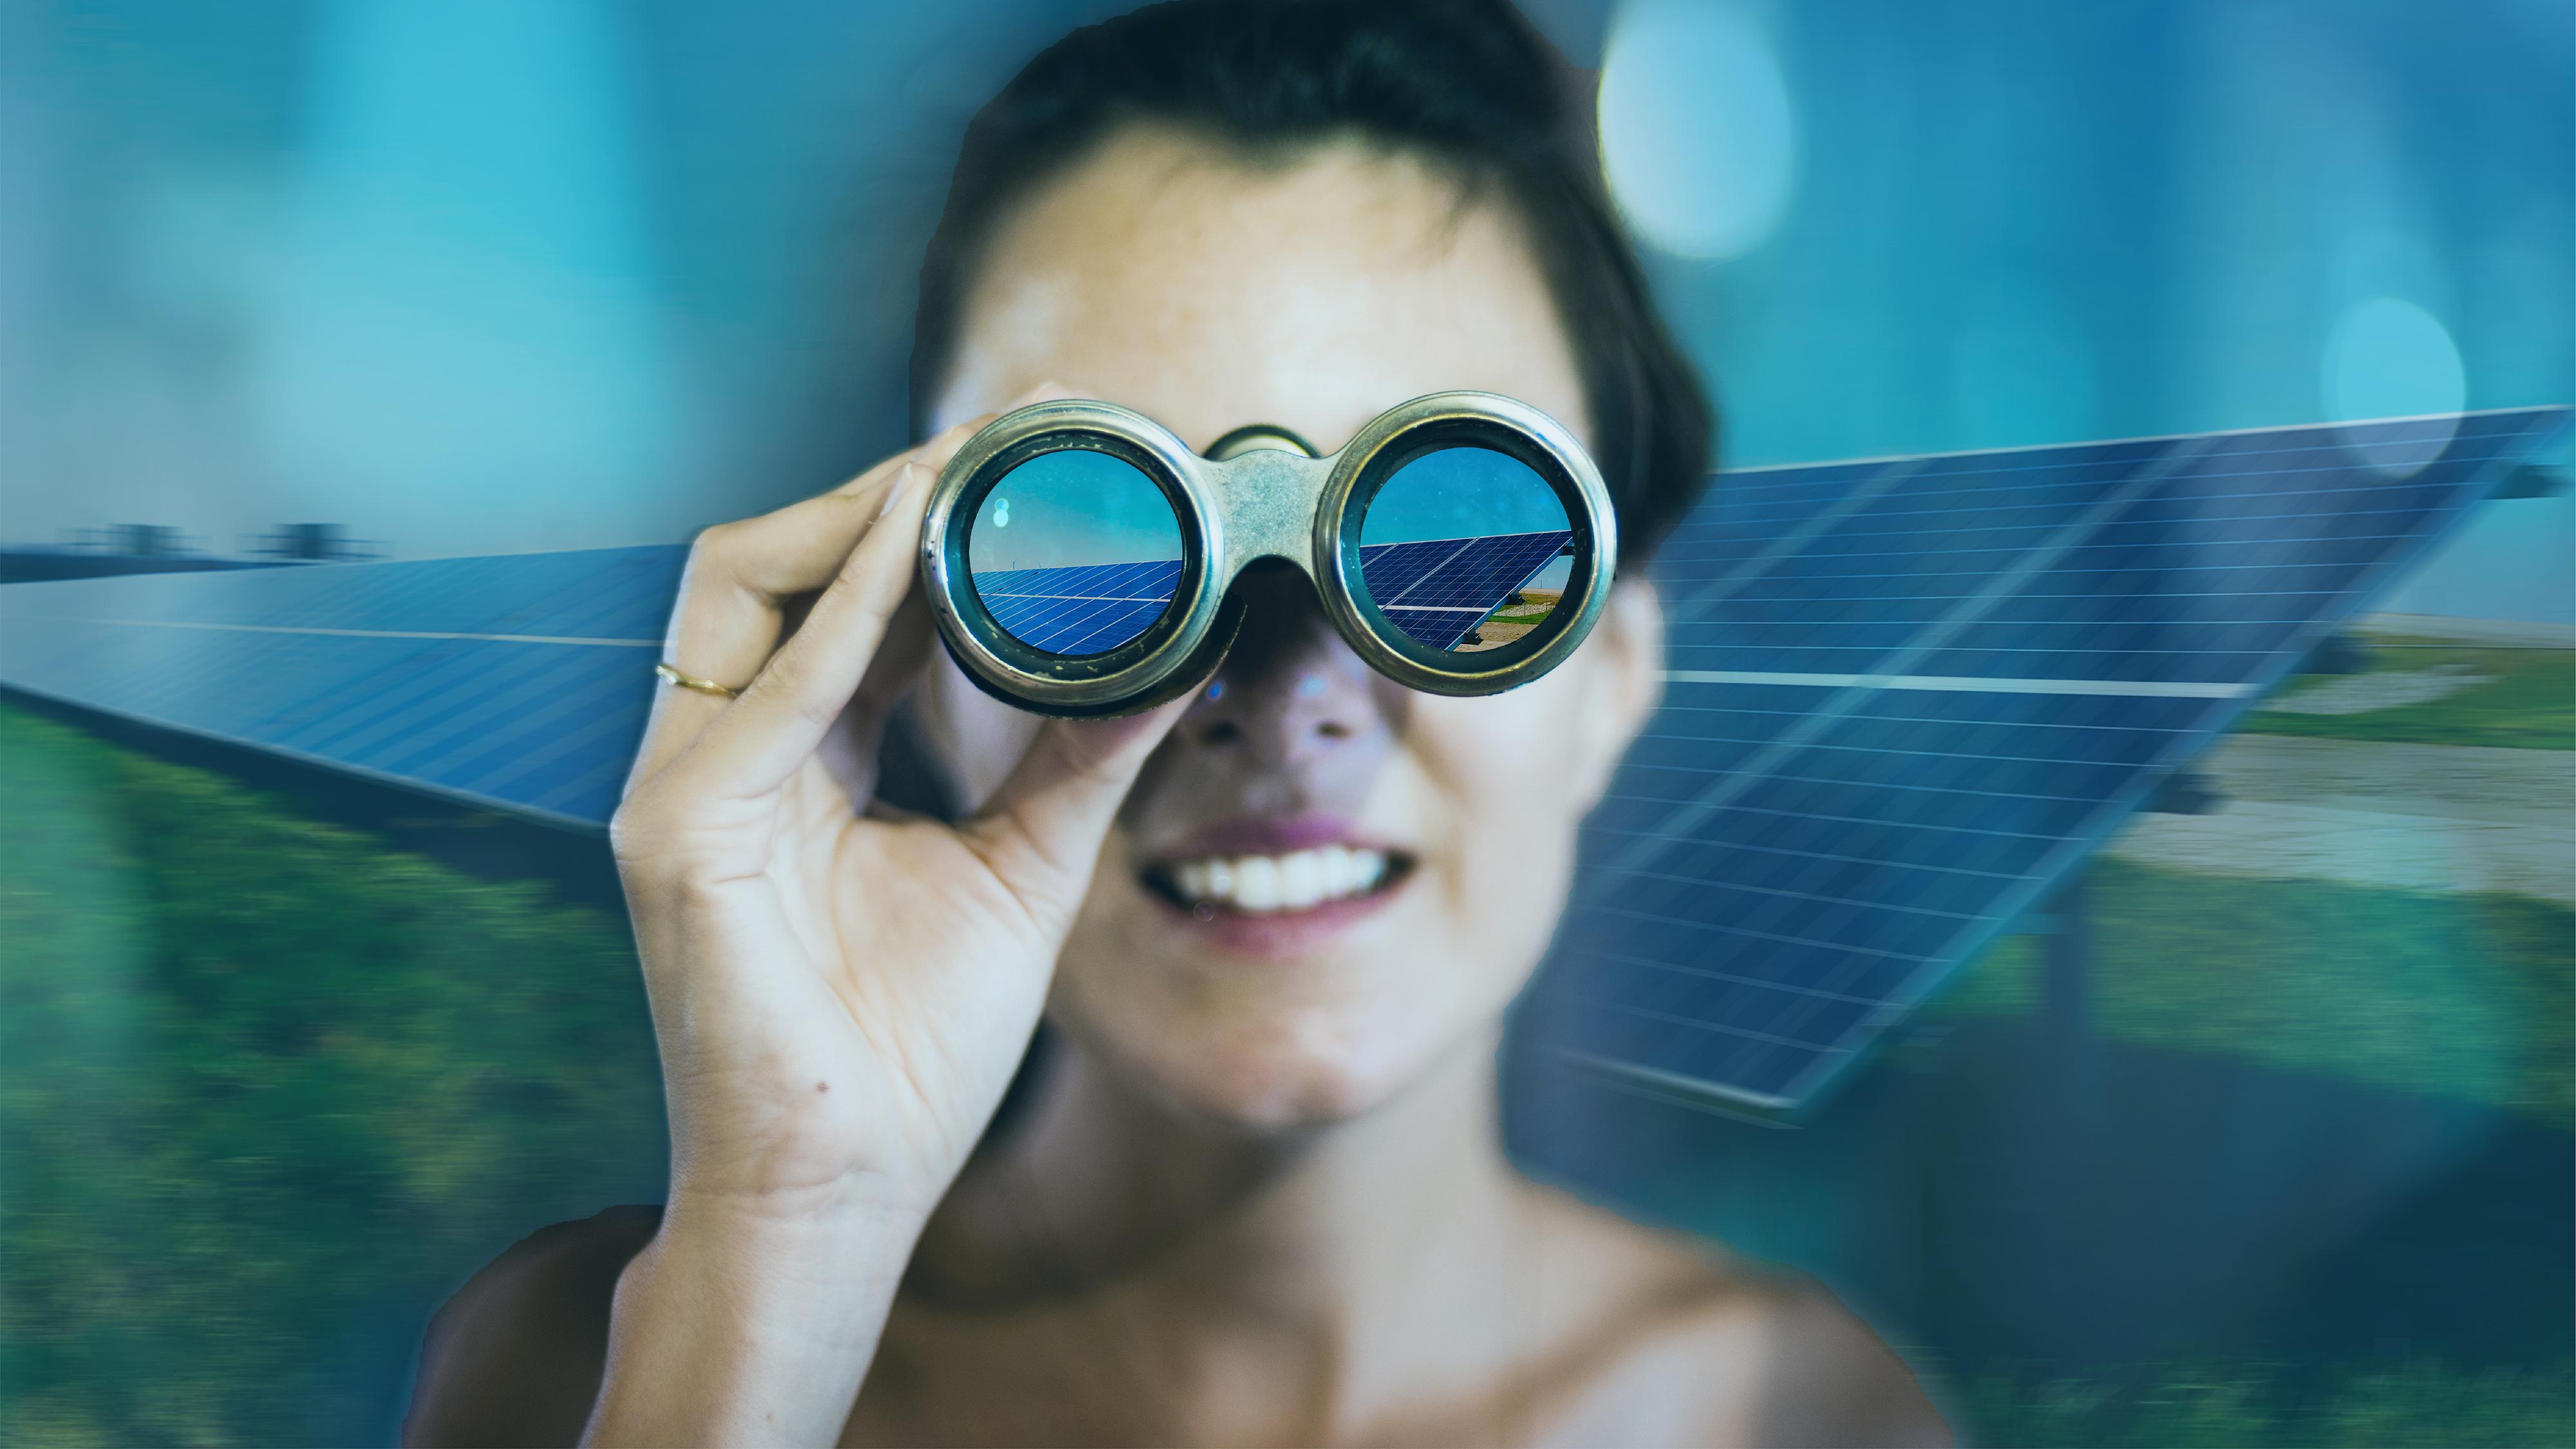 fotovoltaico-09